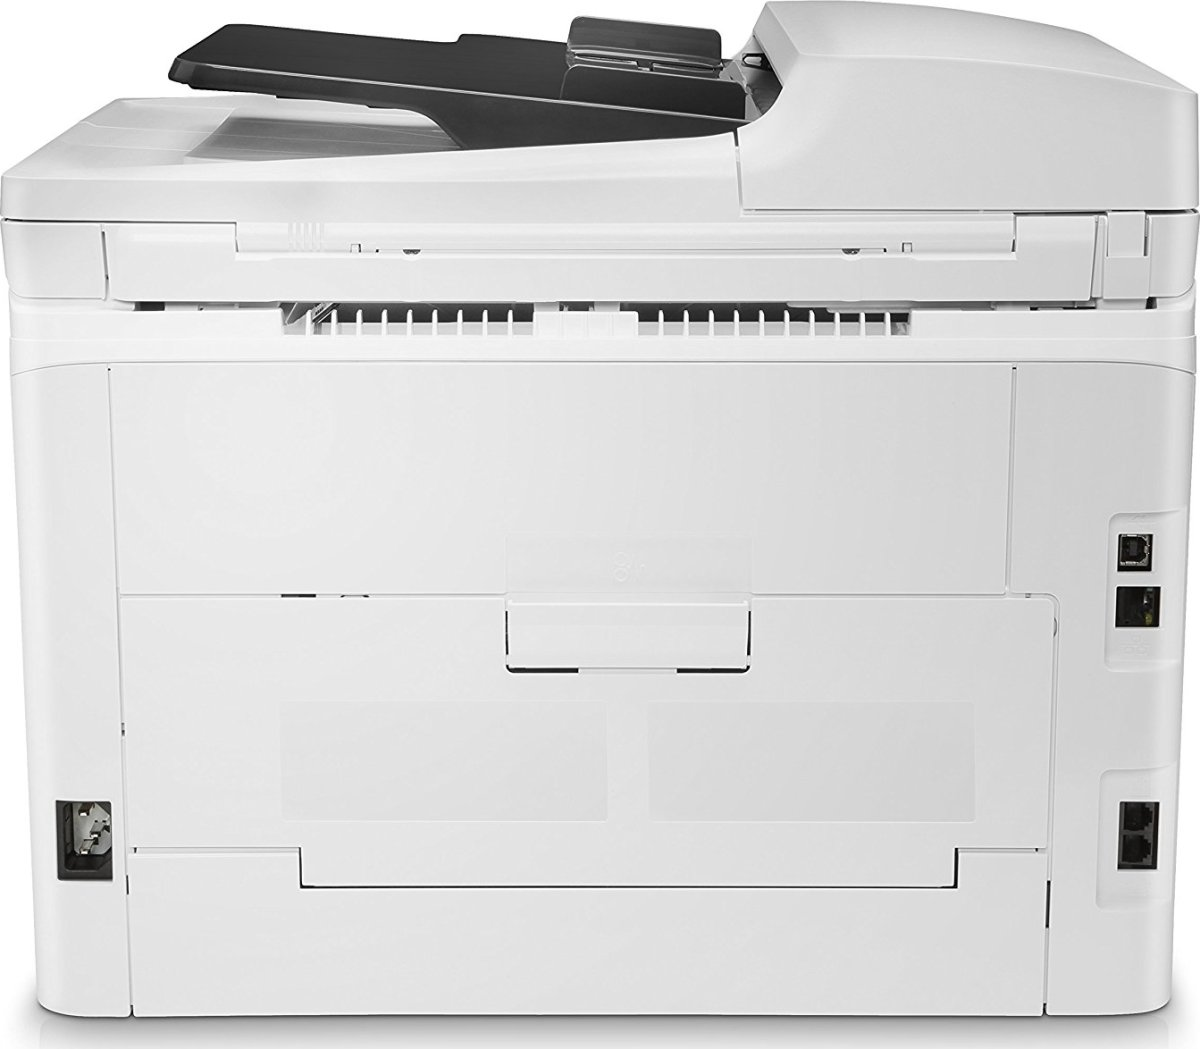 HP Color LaserJet Pro MFP M181fw